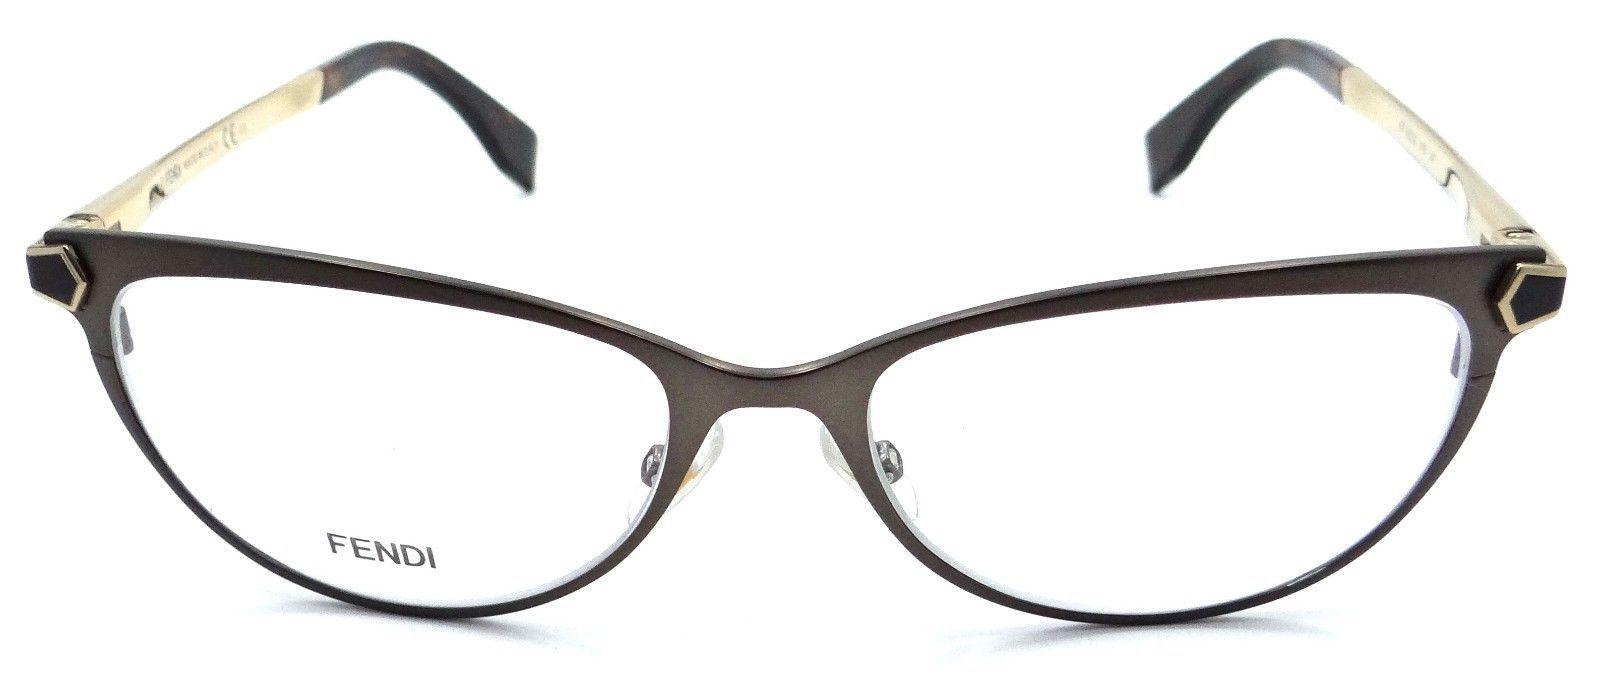 602dca54491 Fendi Rx Eyeglasses Frames FF 0024 7WG and 50 similar items